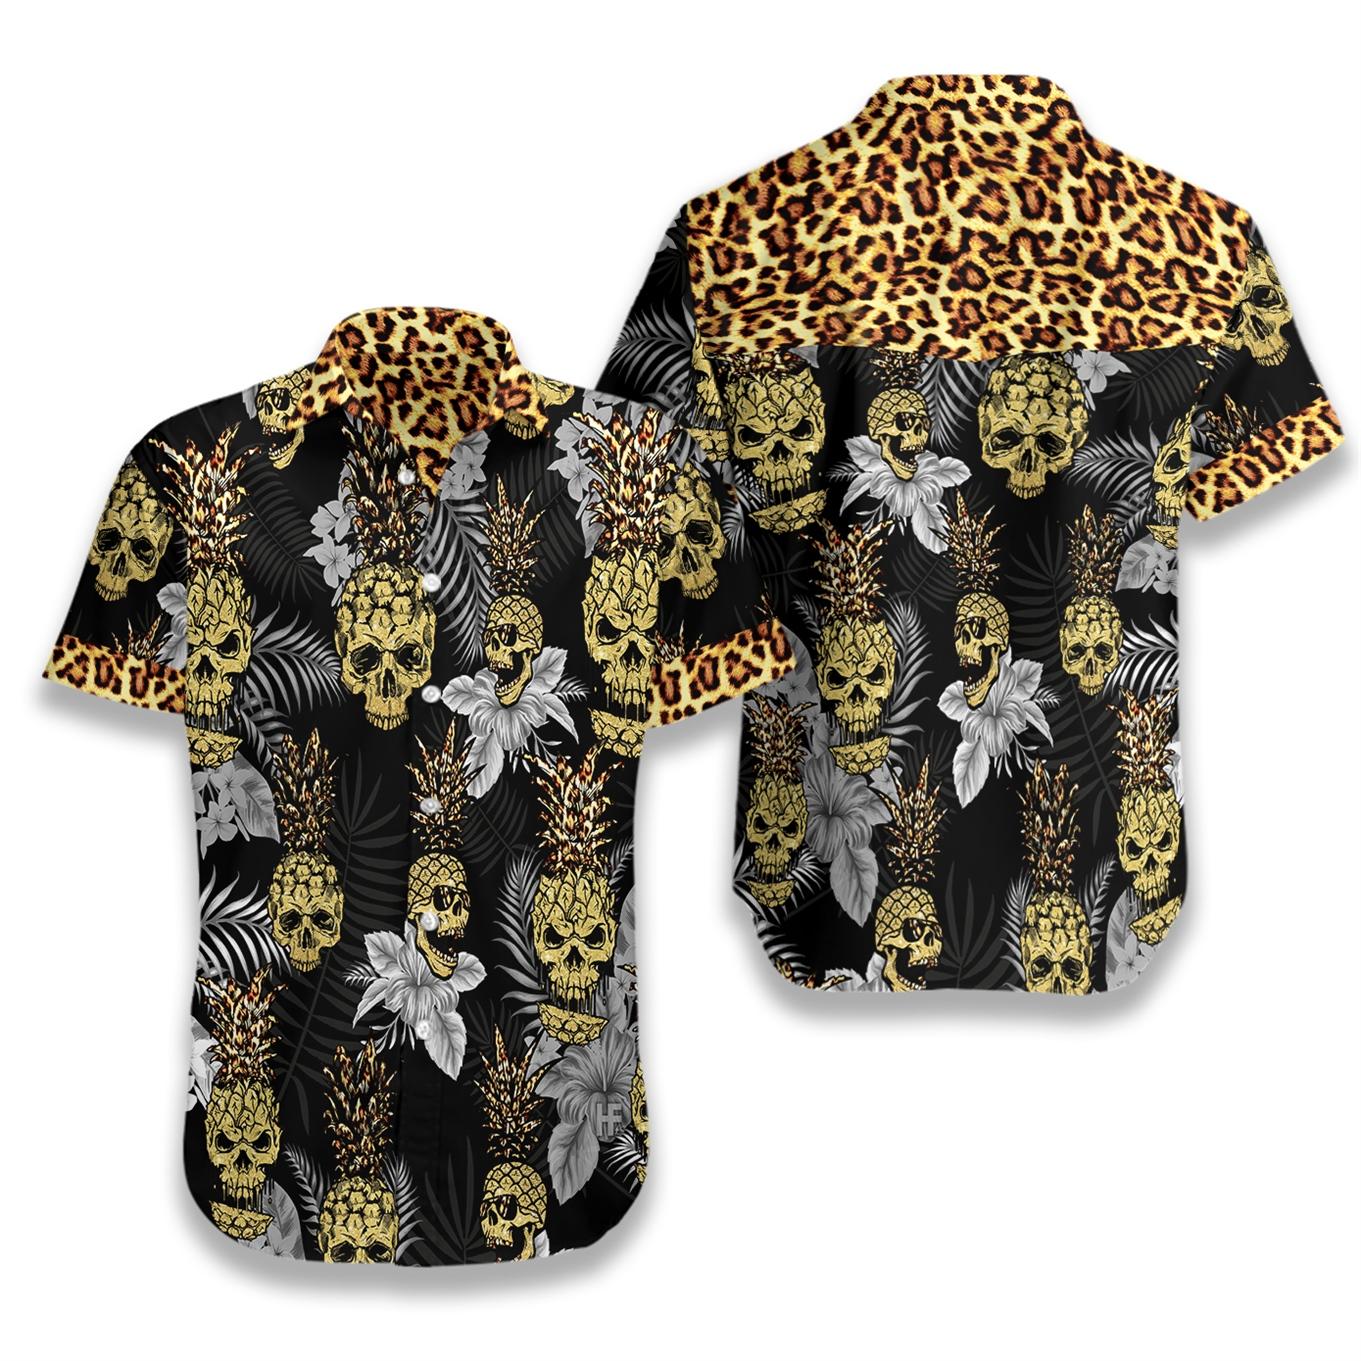 Tropical pine apple skull leopard hawaiian shirt 2